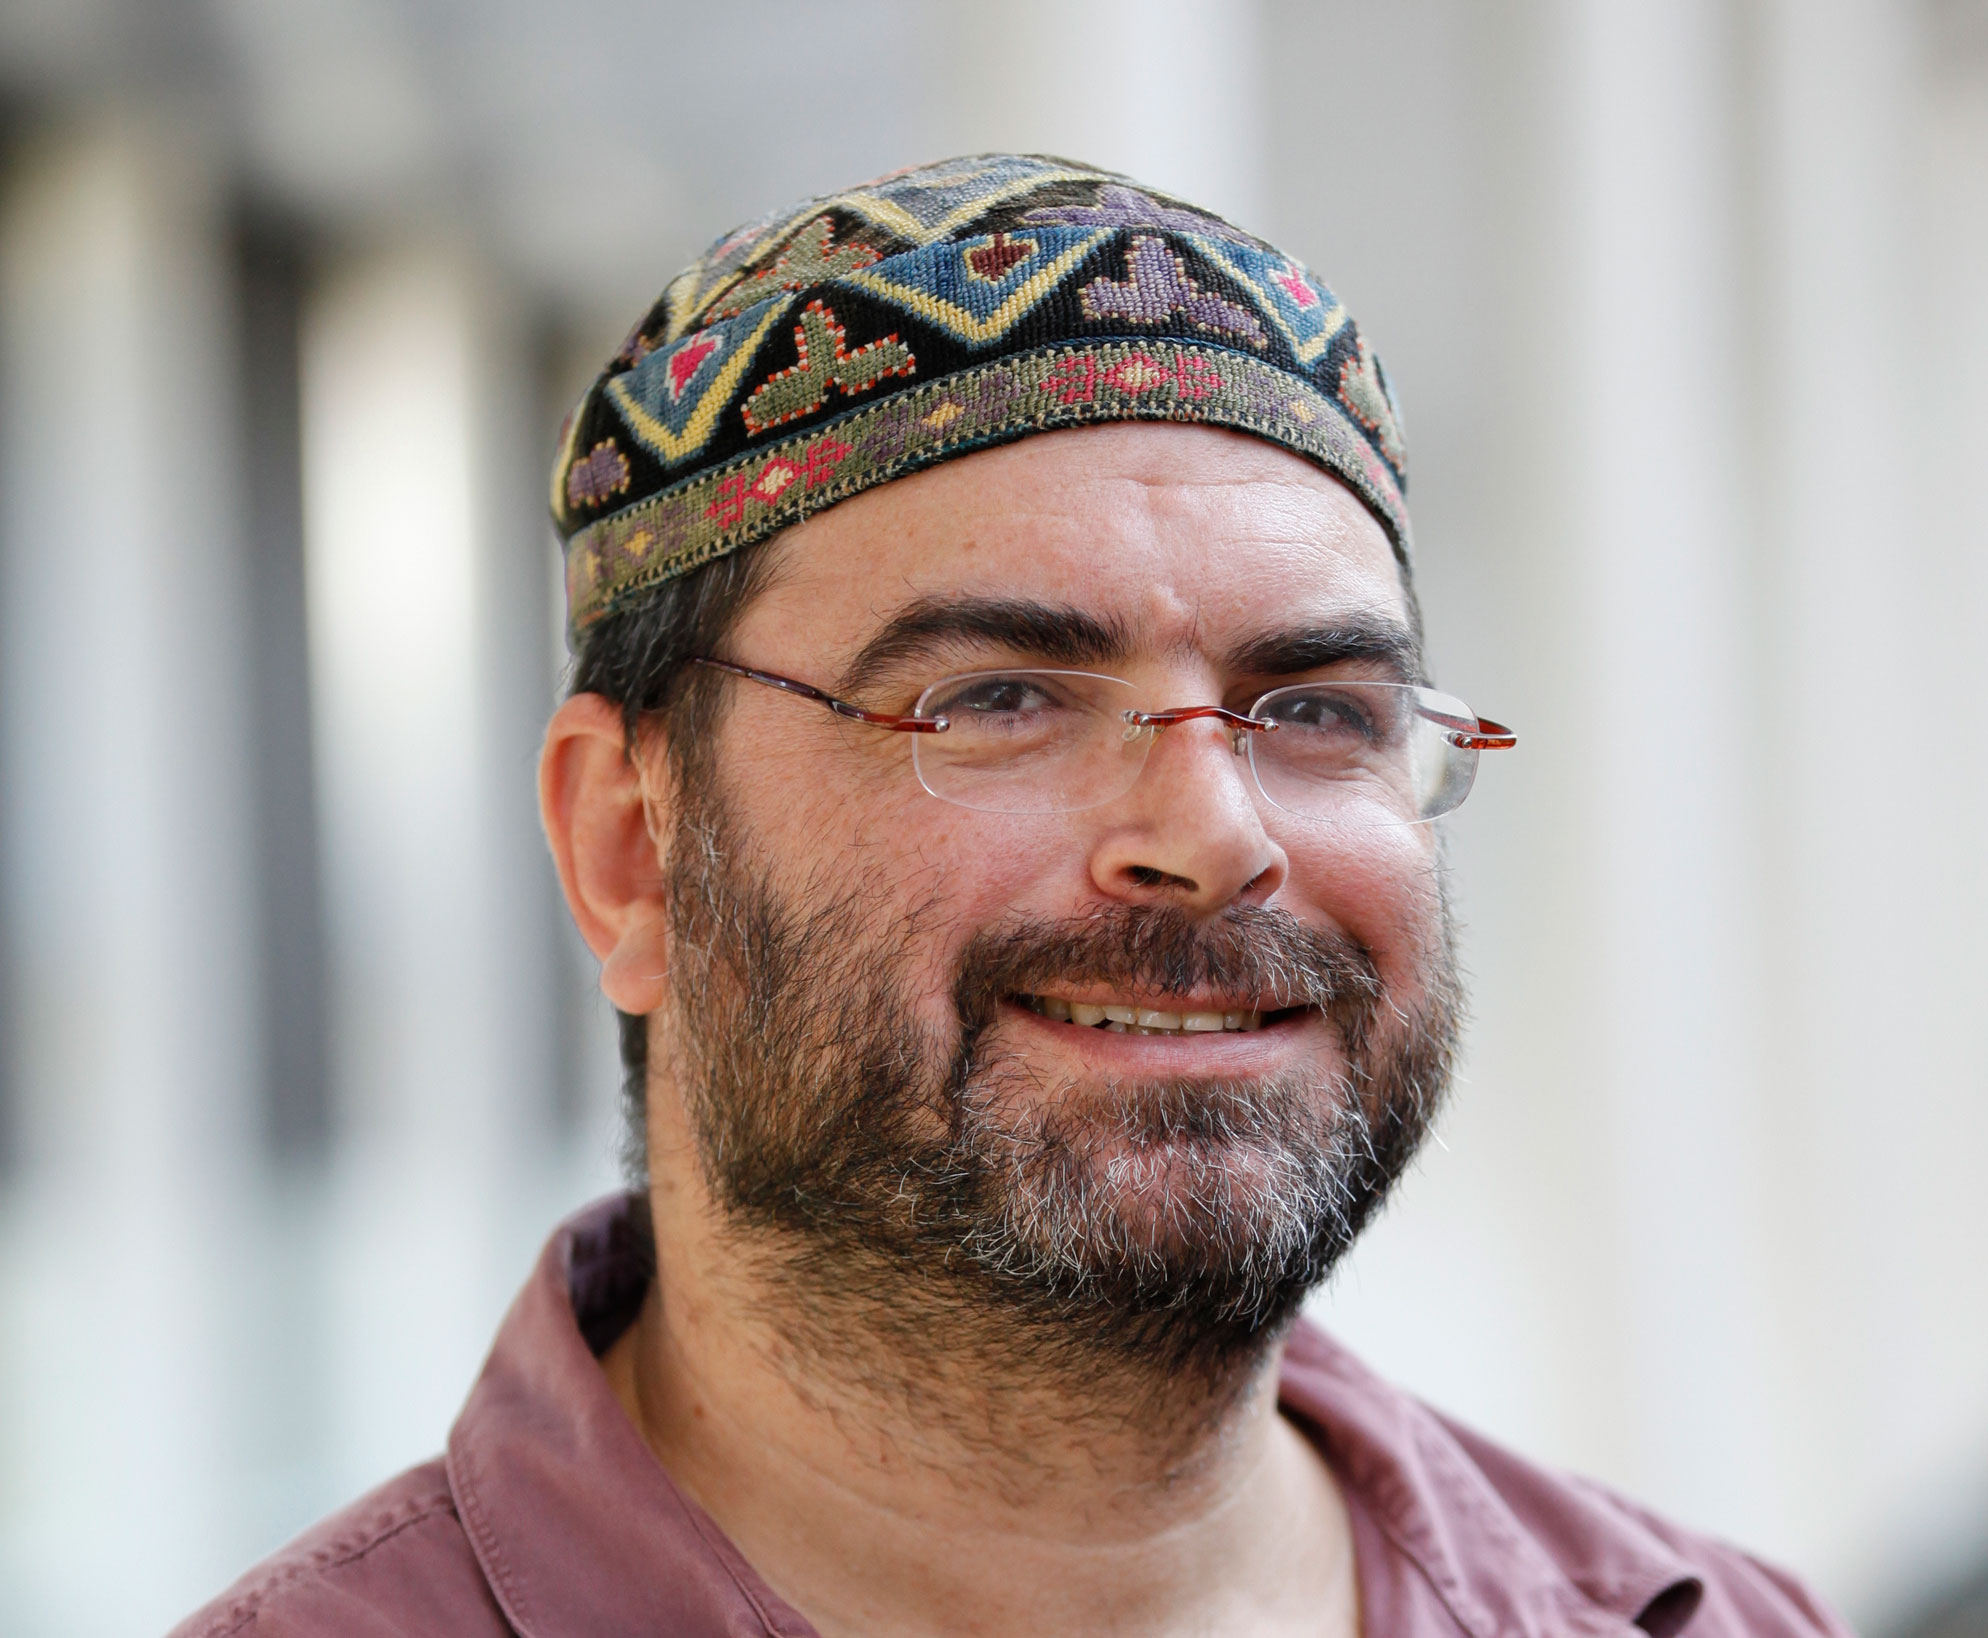 Rabbi Ebn Leader